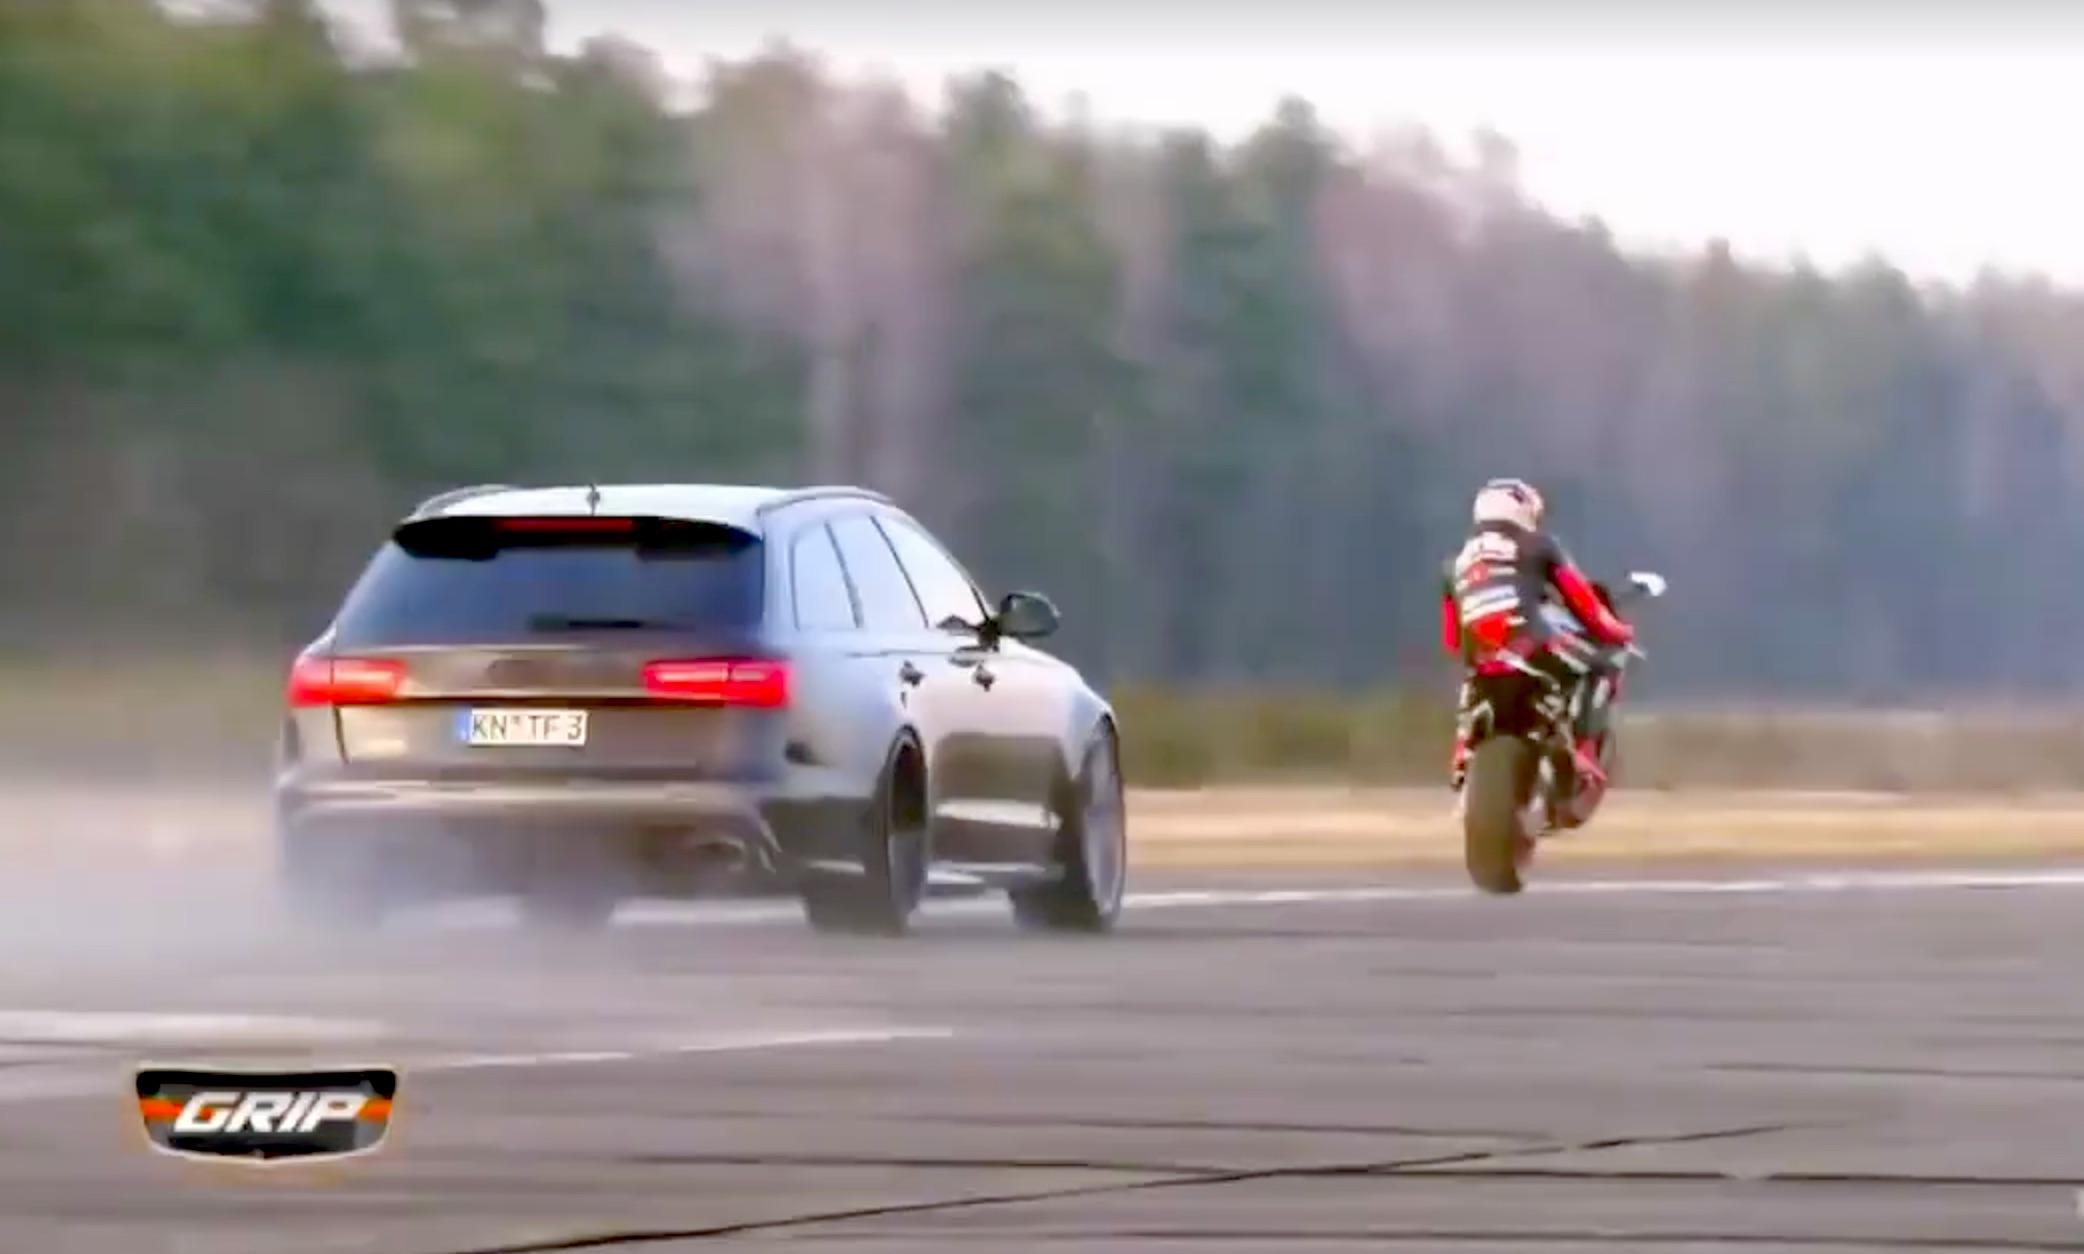 Audi RS6 800 CV vs Aprilia RSV4 con Stefan Bradl, hagan sus apuestas